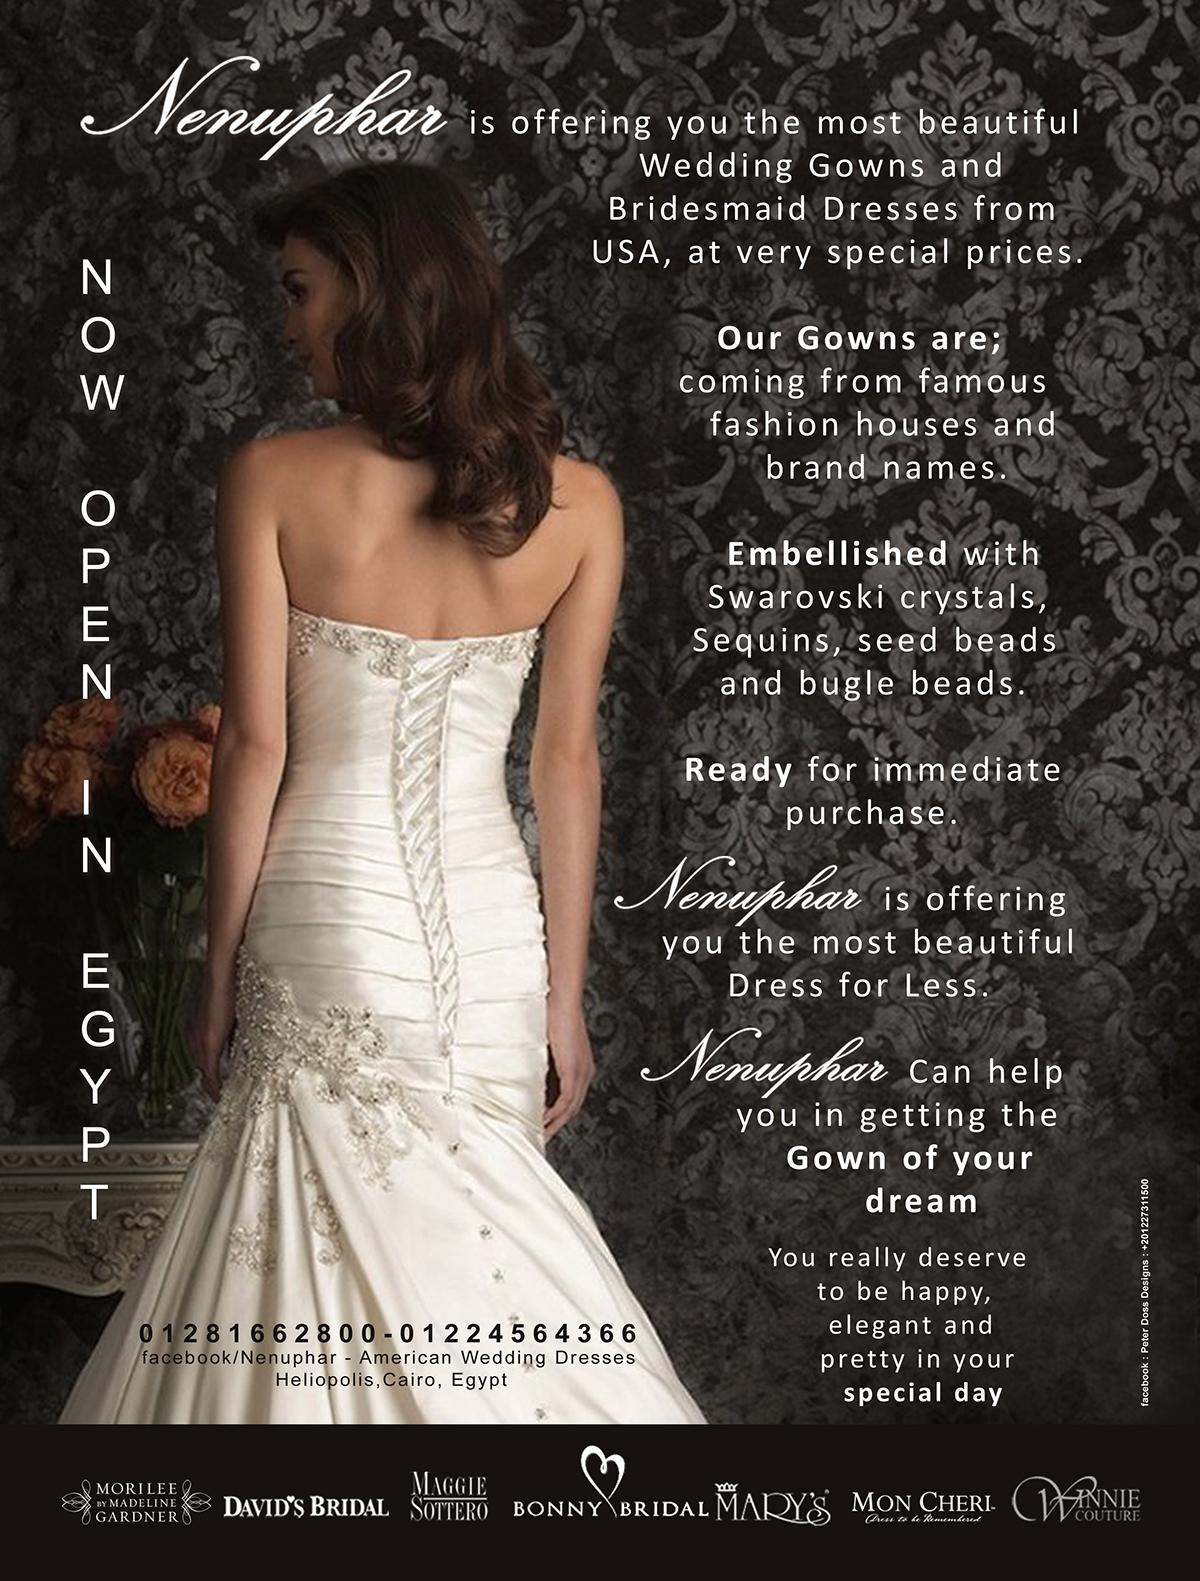 Nenuphar American Wedding Dresses on Wacom Gallery